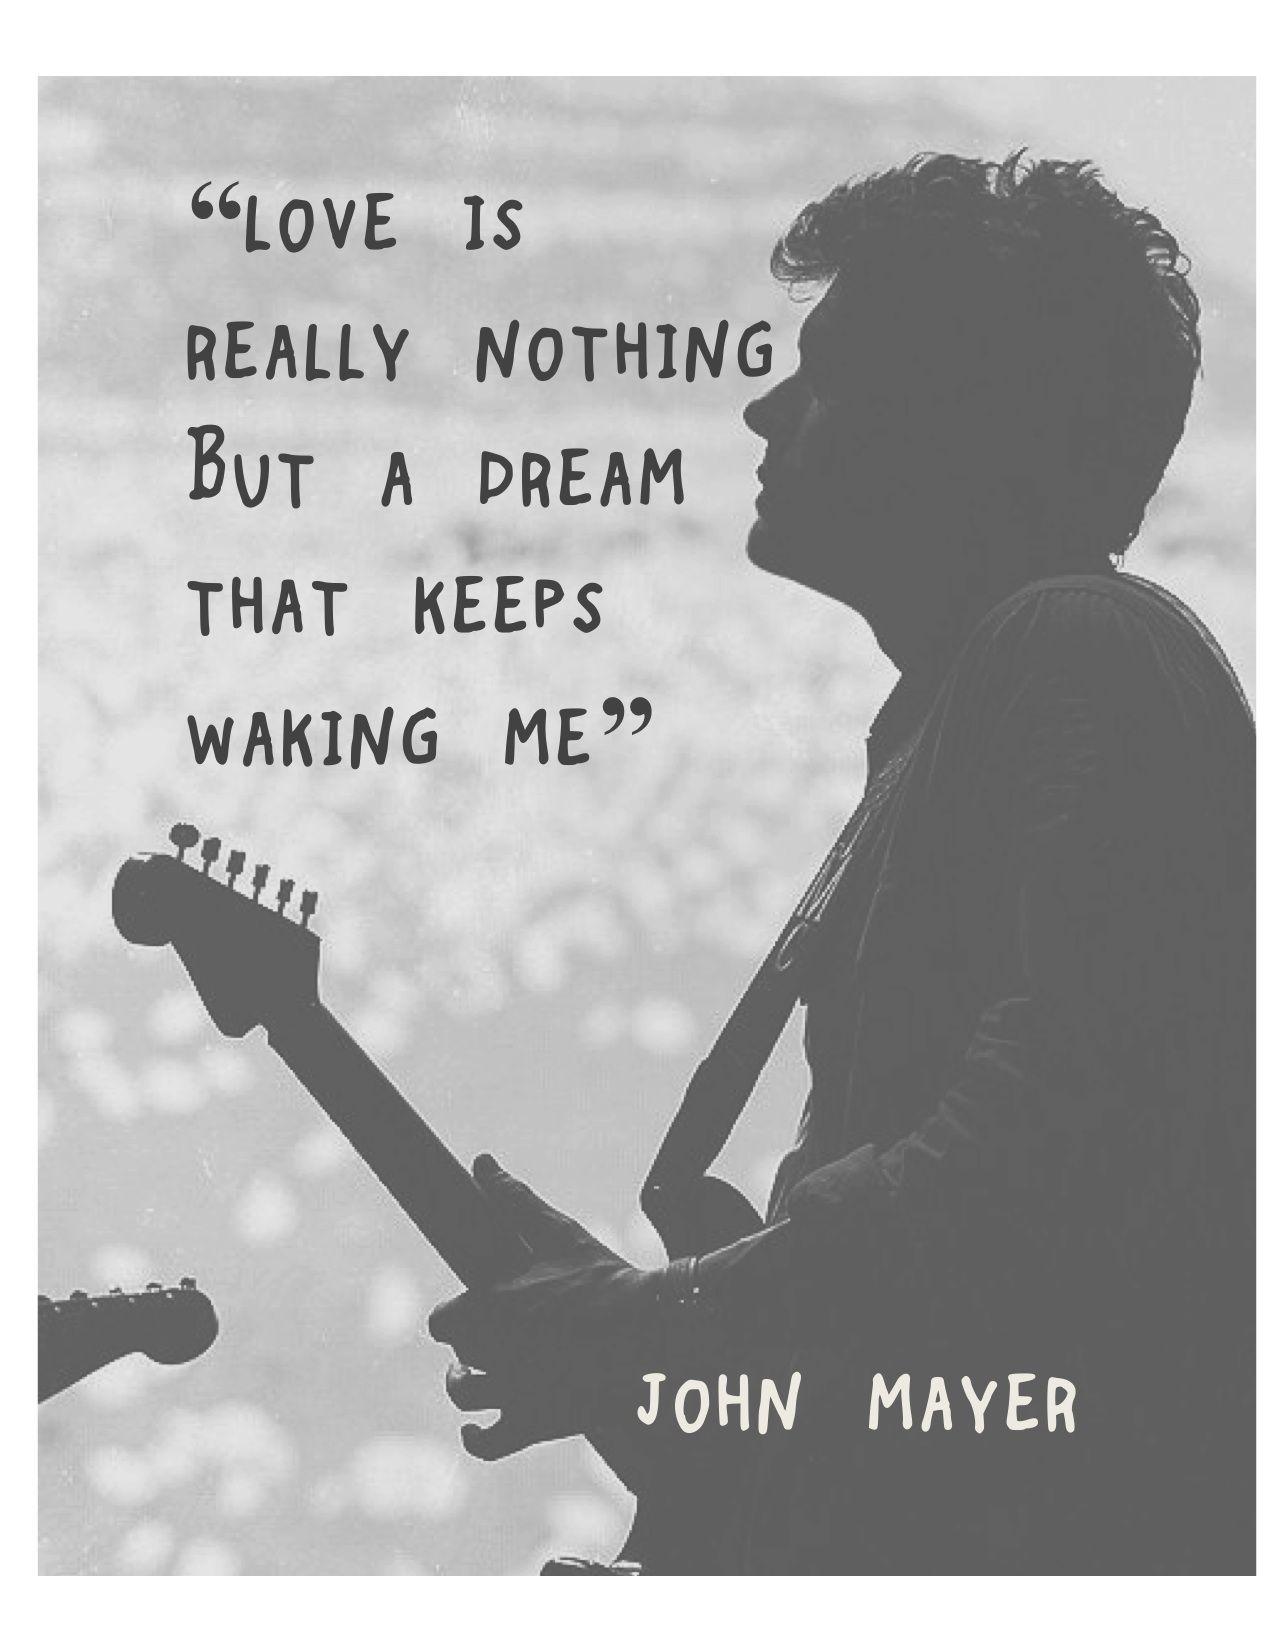 I Love You Quotes John Mayer : John Mayer #edgeofdesire #john #mayer Quotes,Songs, and Sayings P ...